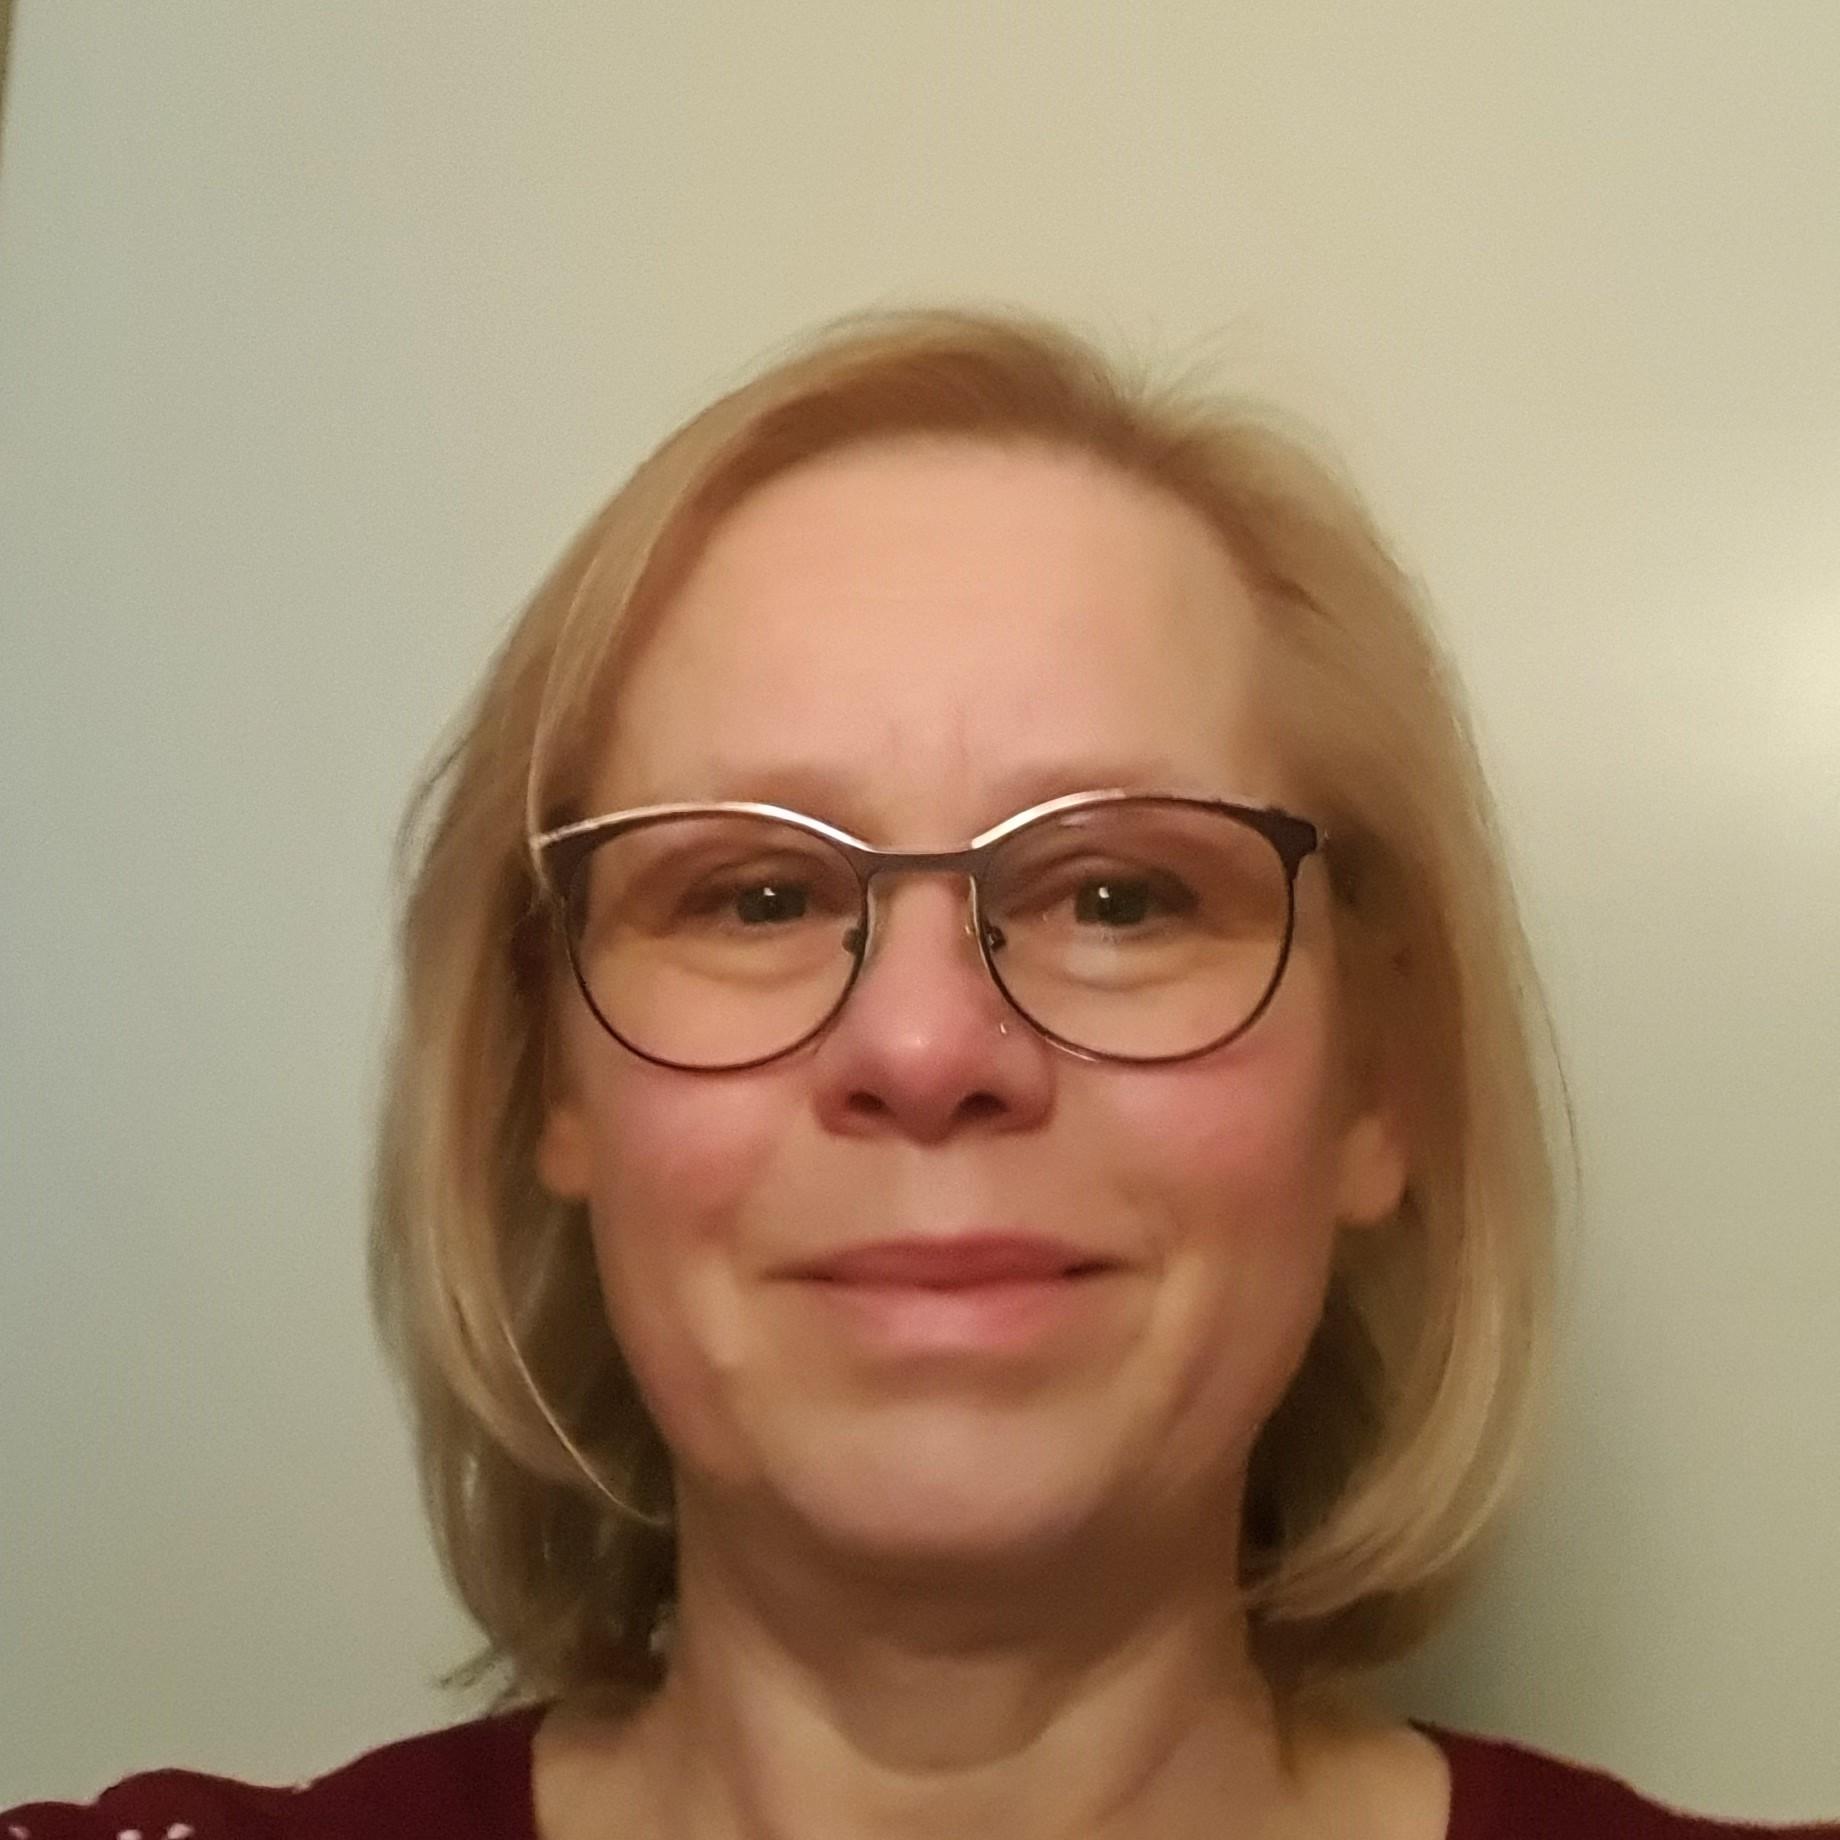 cv web de myriam meddeb - directrice